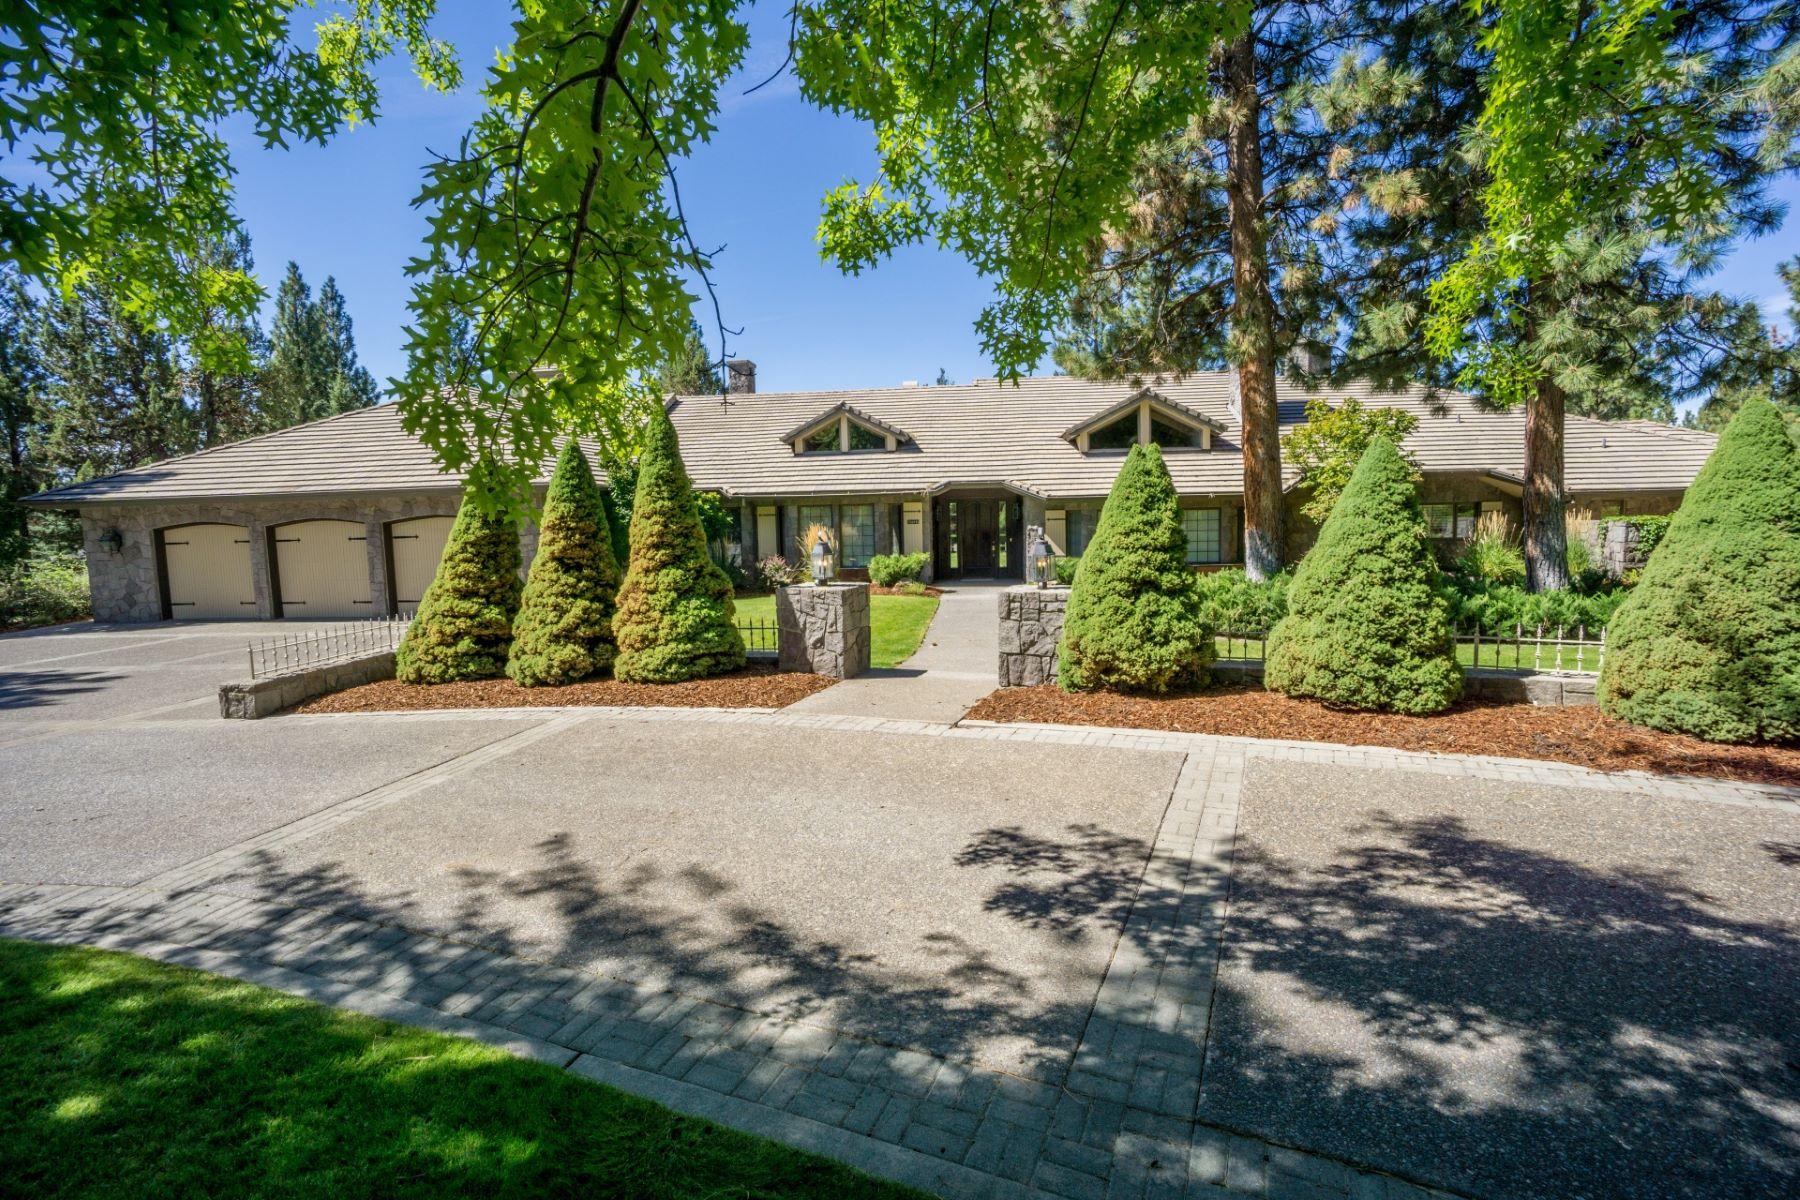 Other Residential Homes για την Πώληση στο 69919 California Trail Sisters, OR 97759 Sisters, Ορεγκον 97759 Ηνωμένες Πολιτείες